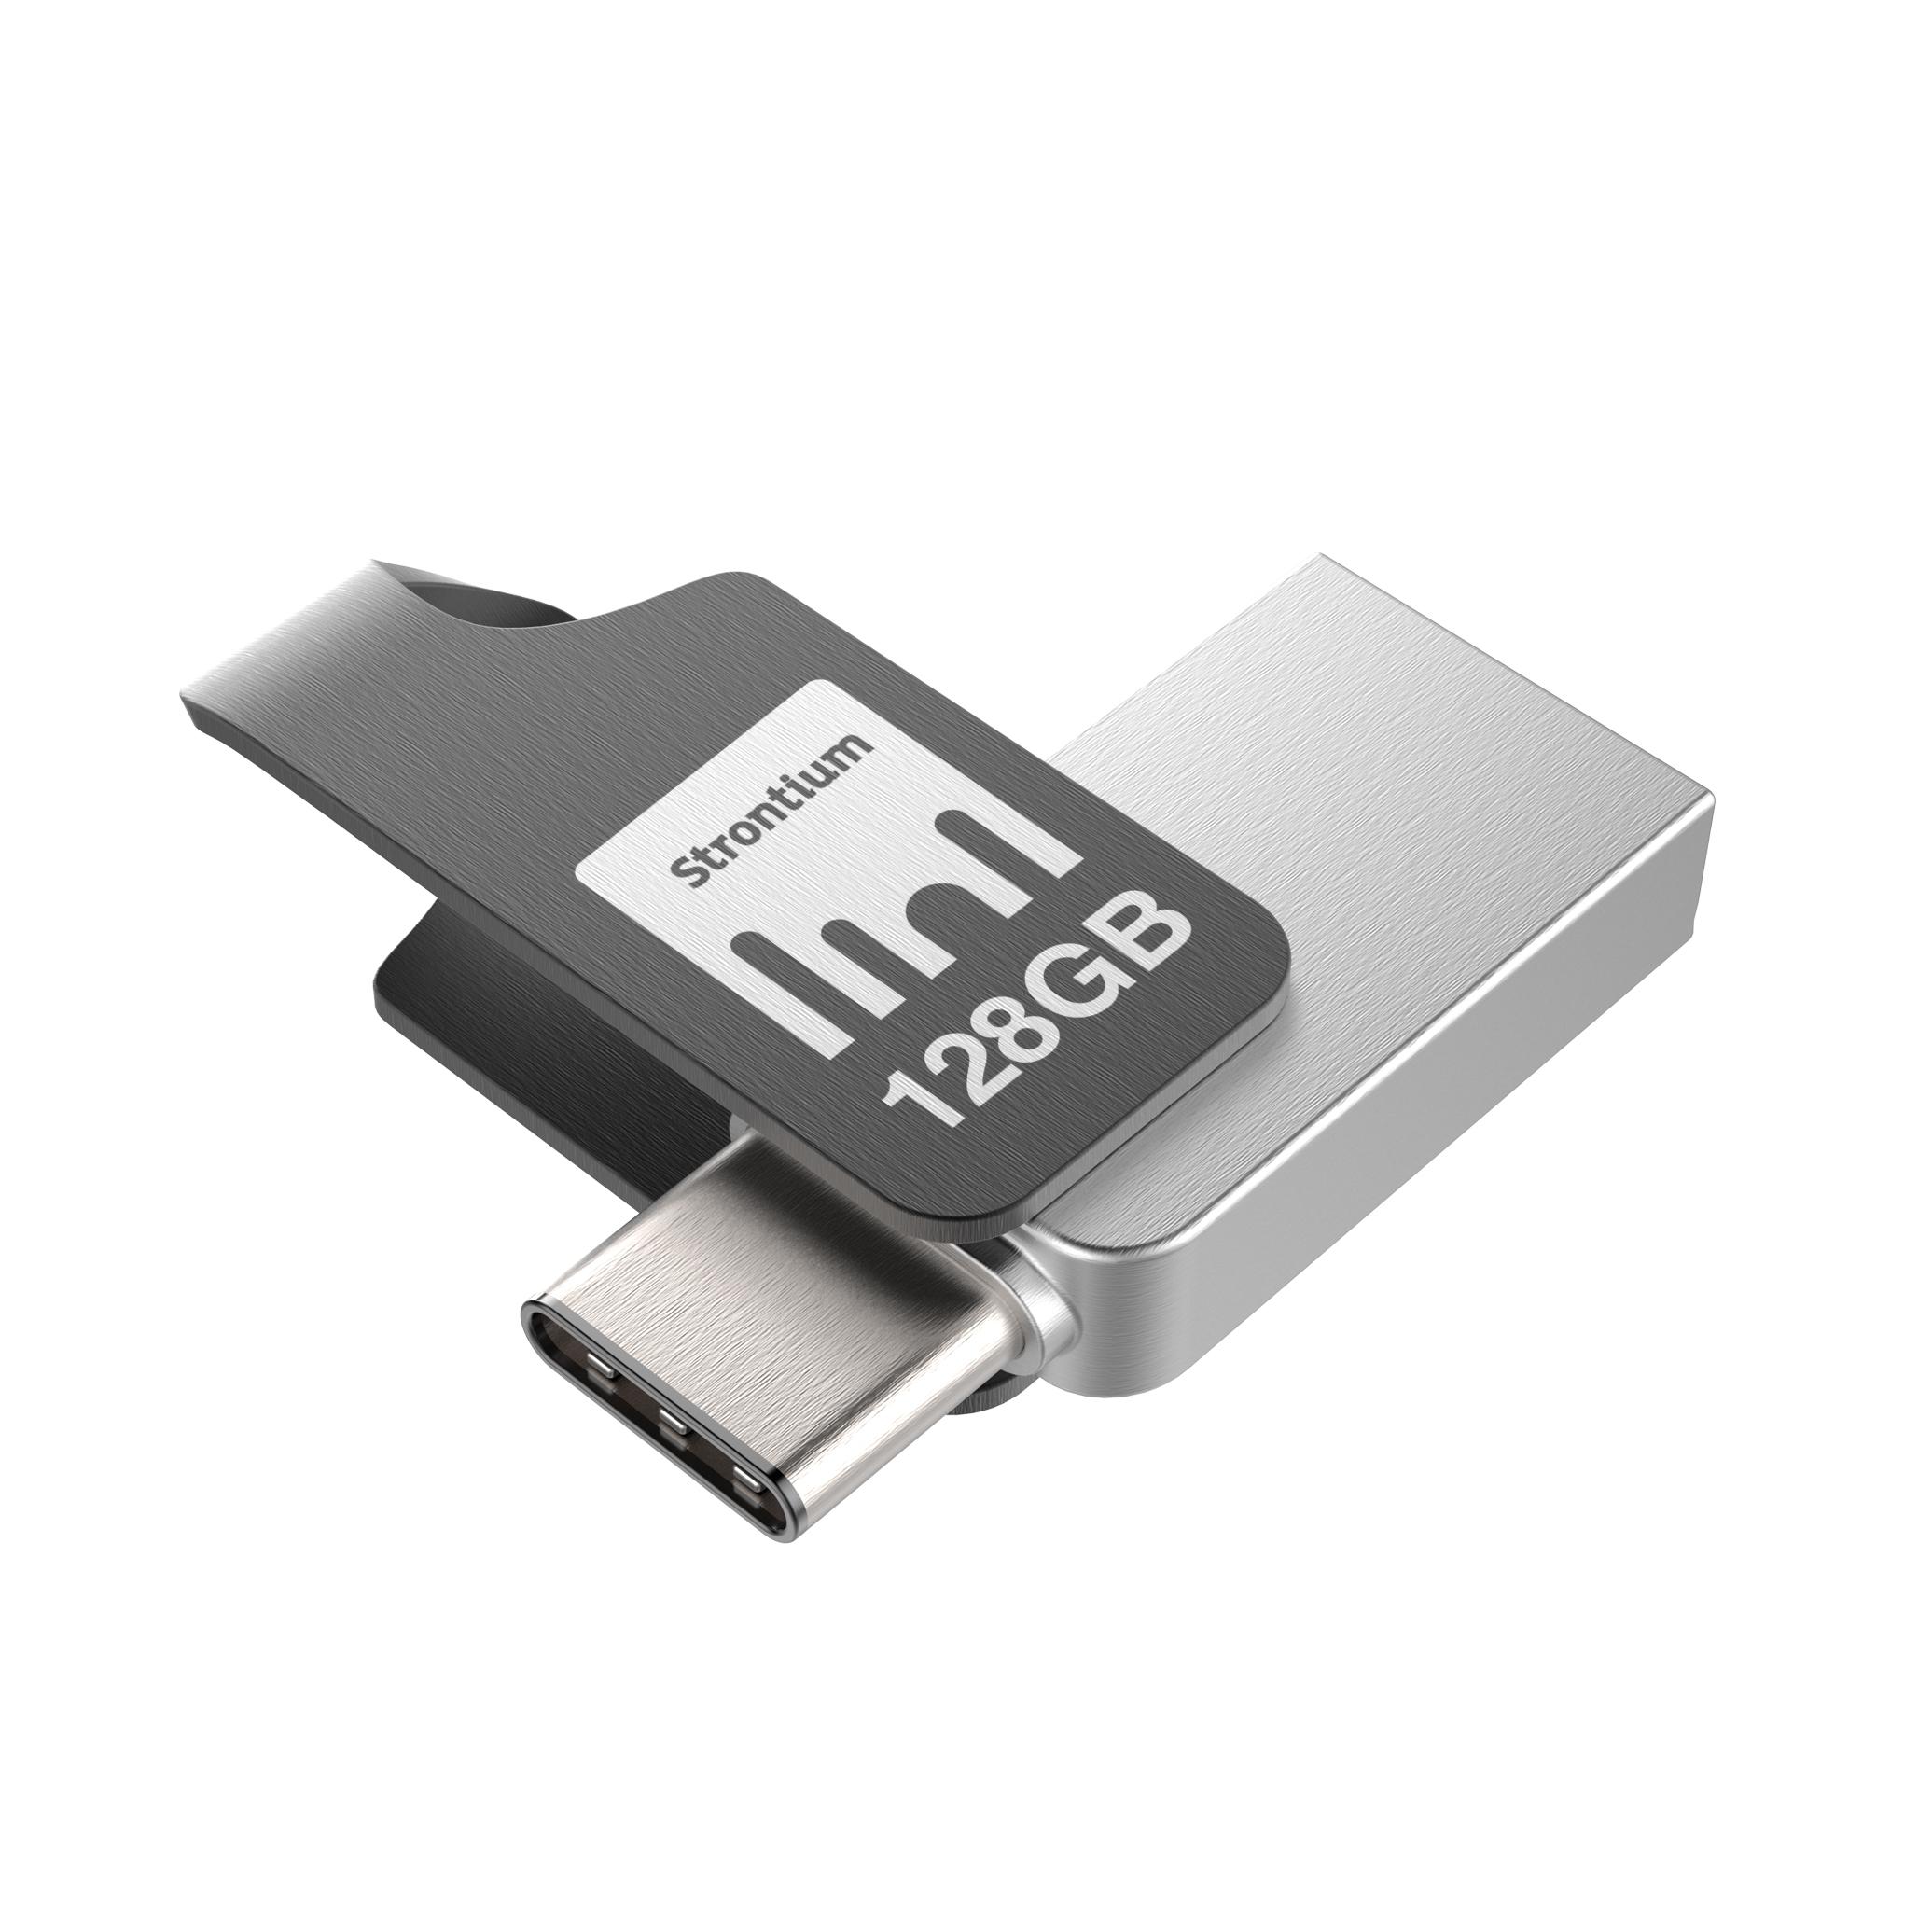 OTG USB Drives | On-The-Go USB Drives | Nitro OTG Drives